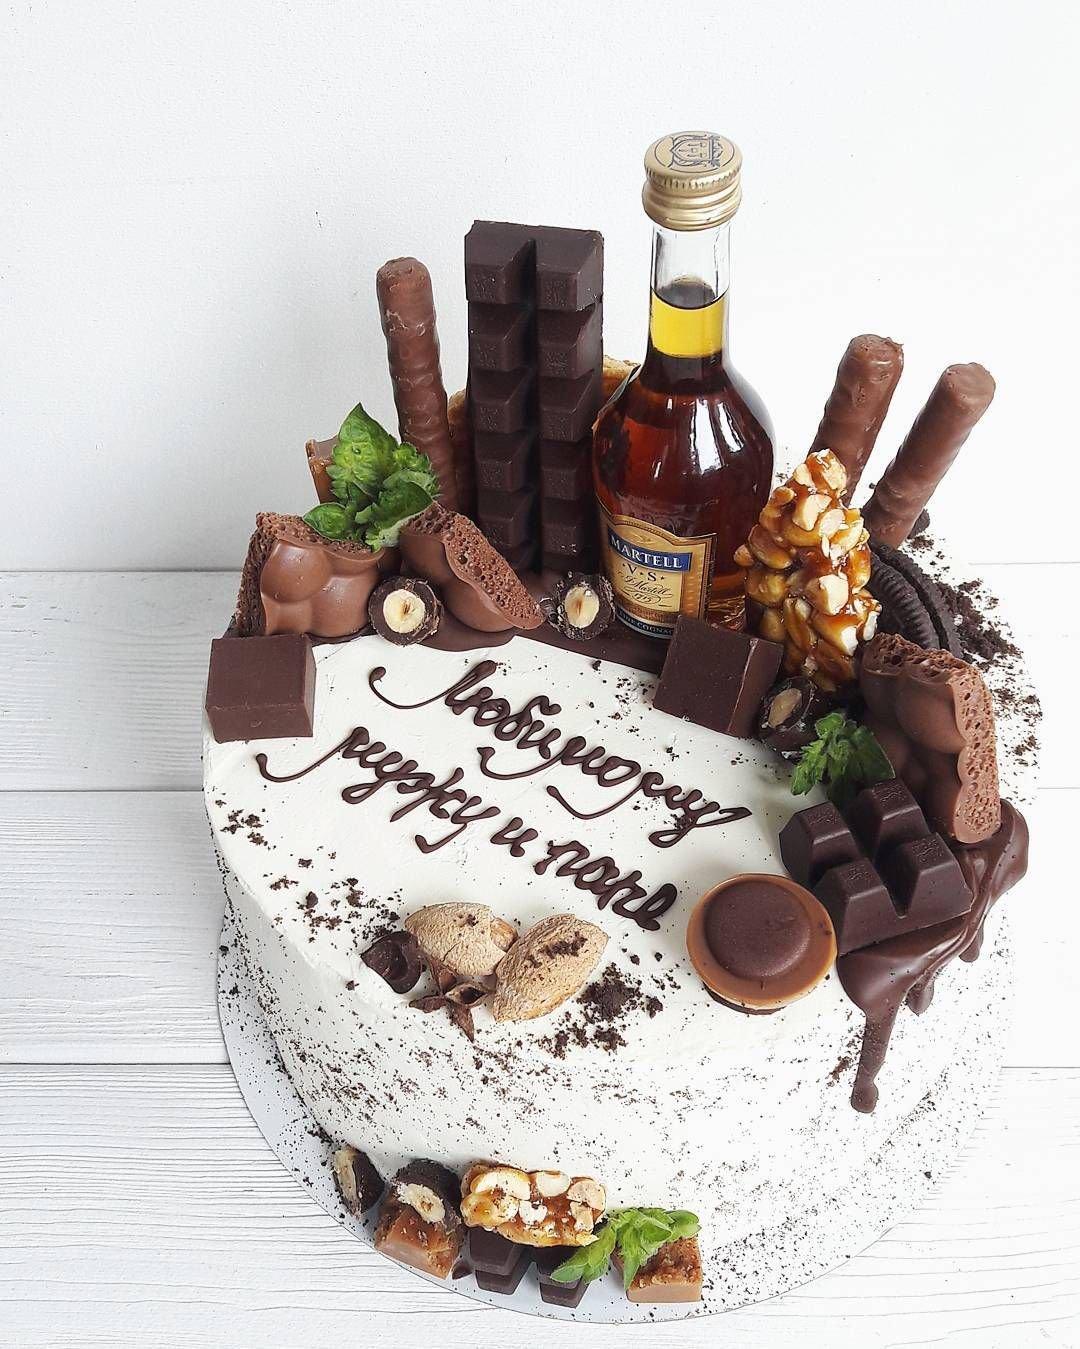 торт фото с днем рождения взрослому мужчине